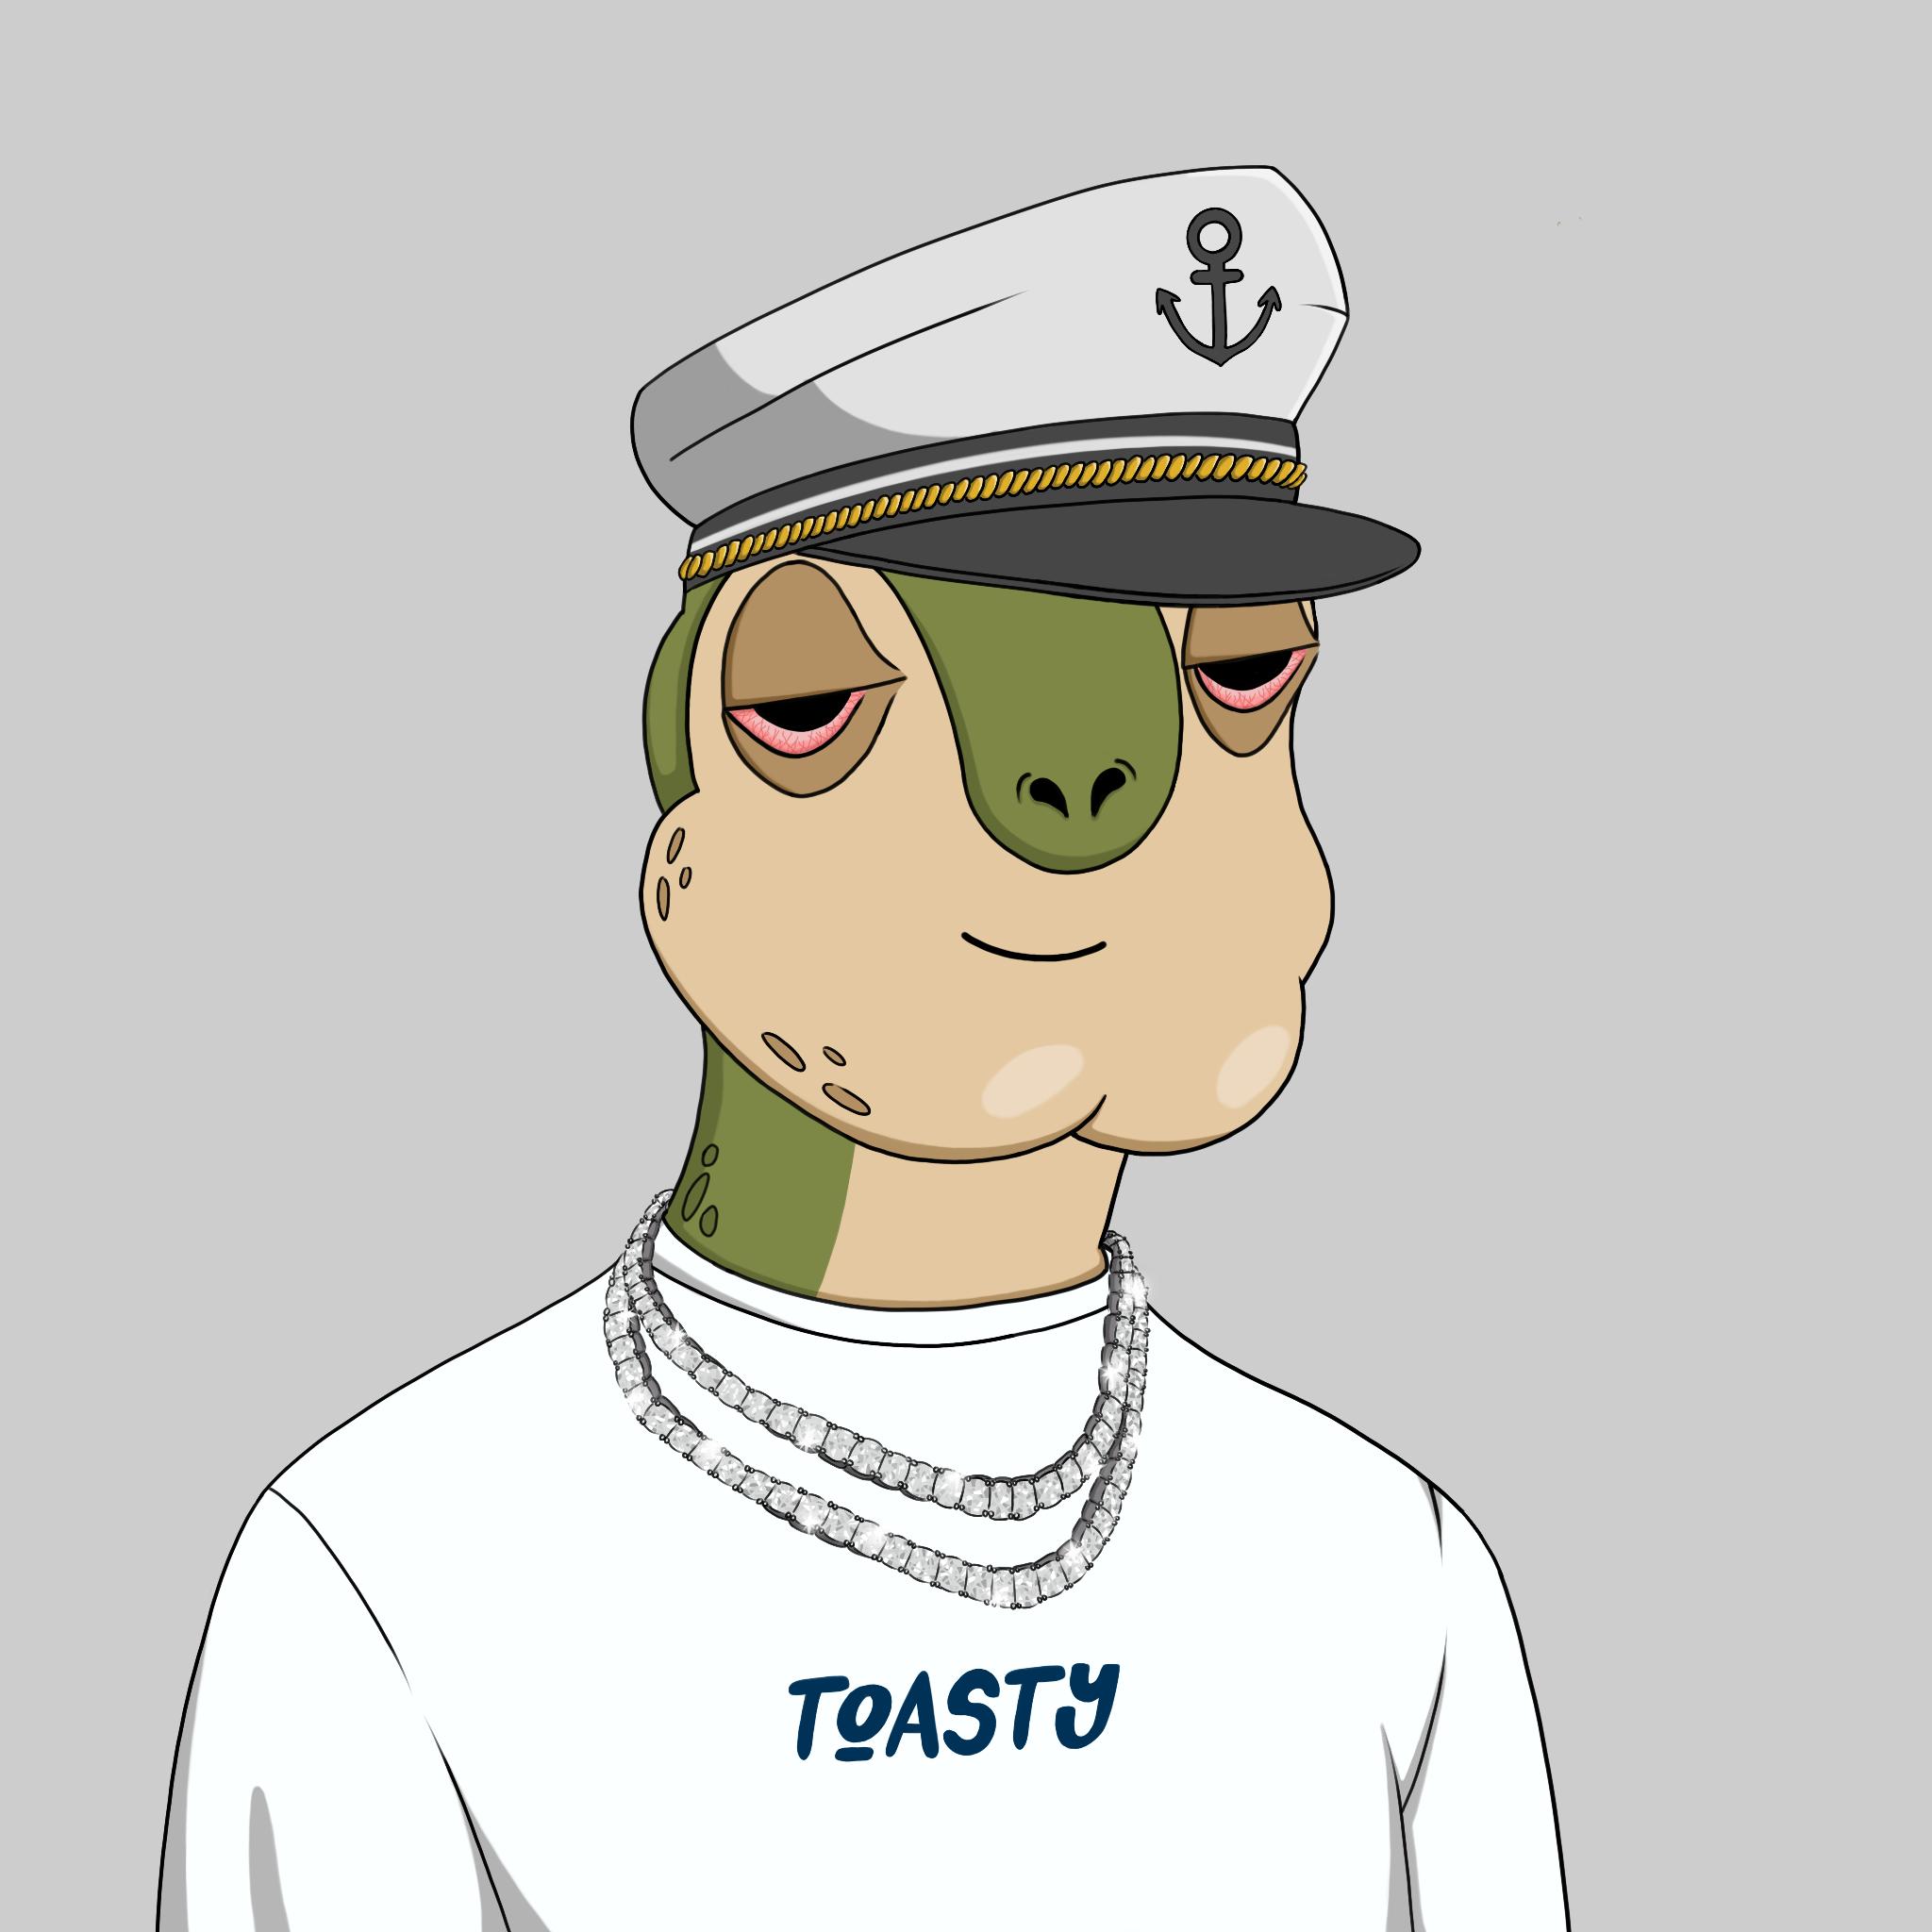 Toasy Turts #0437